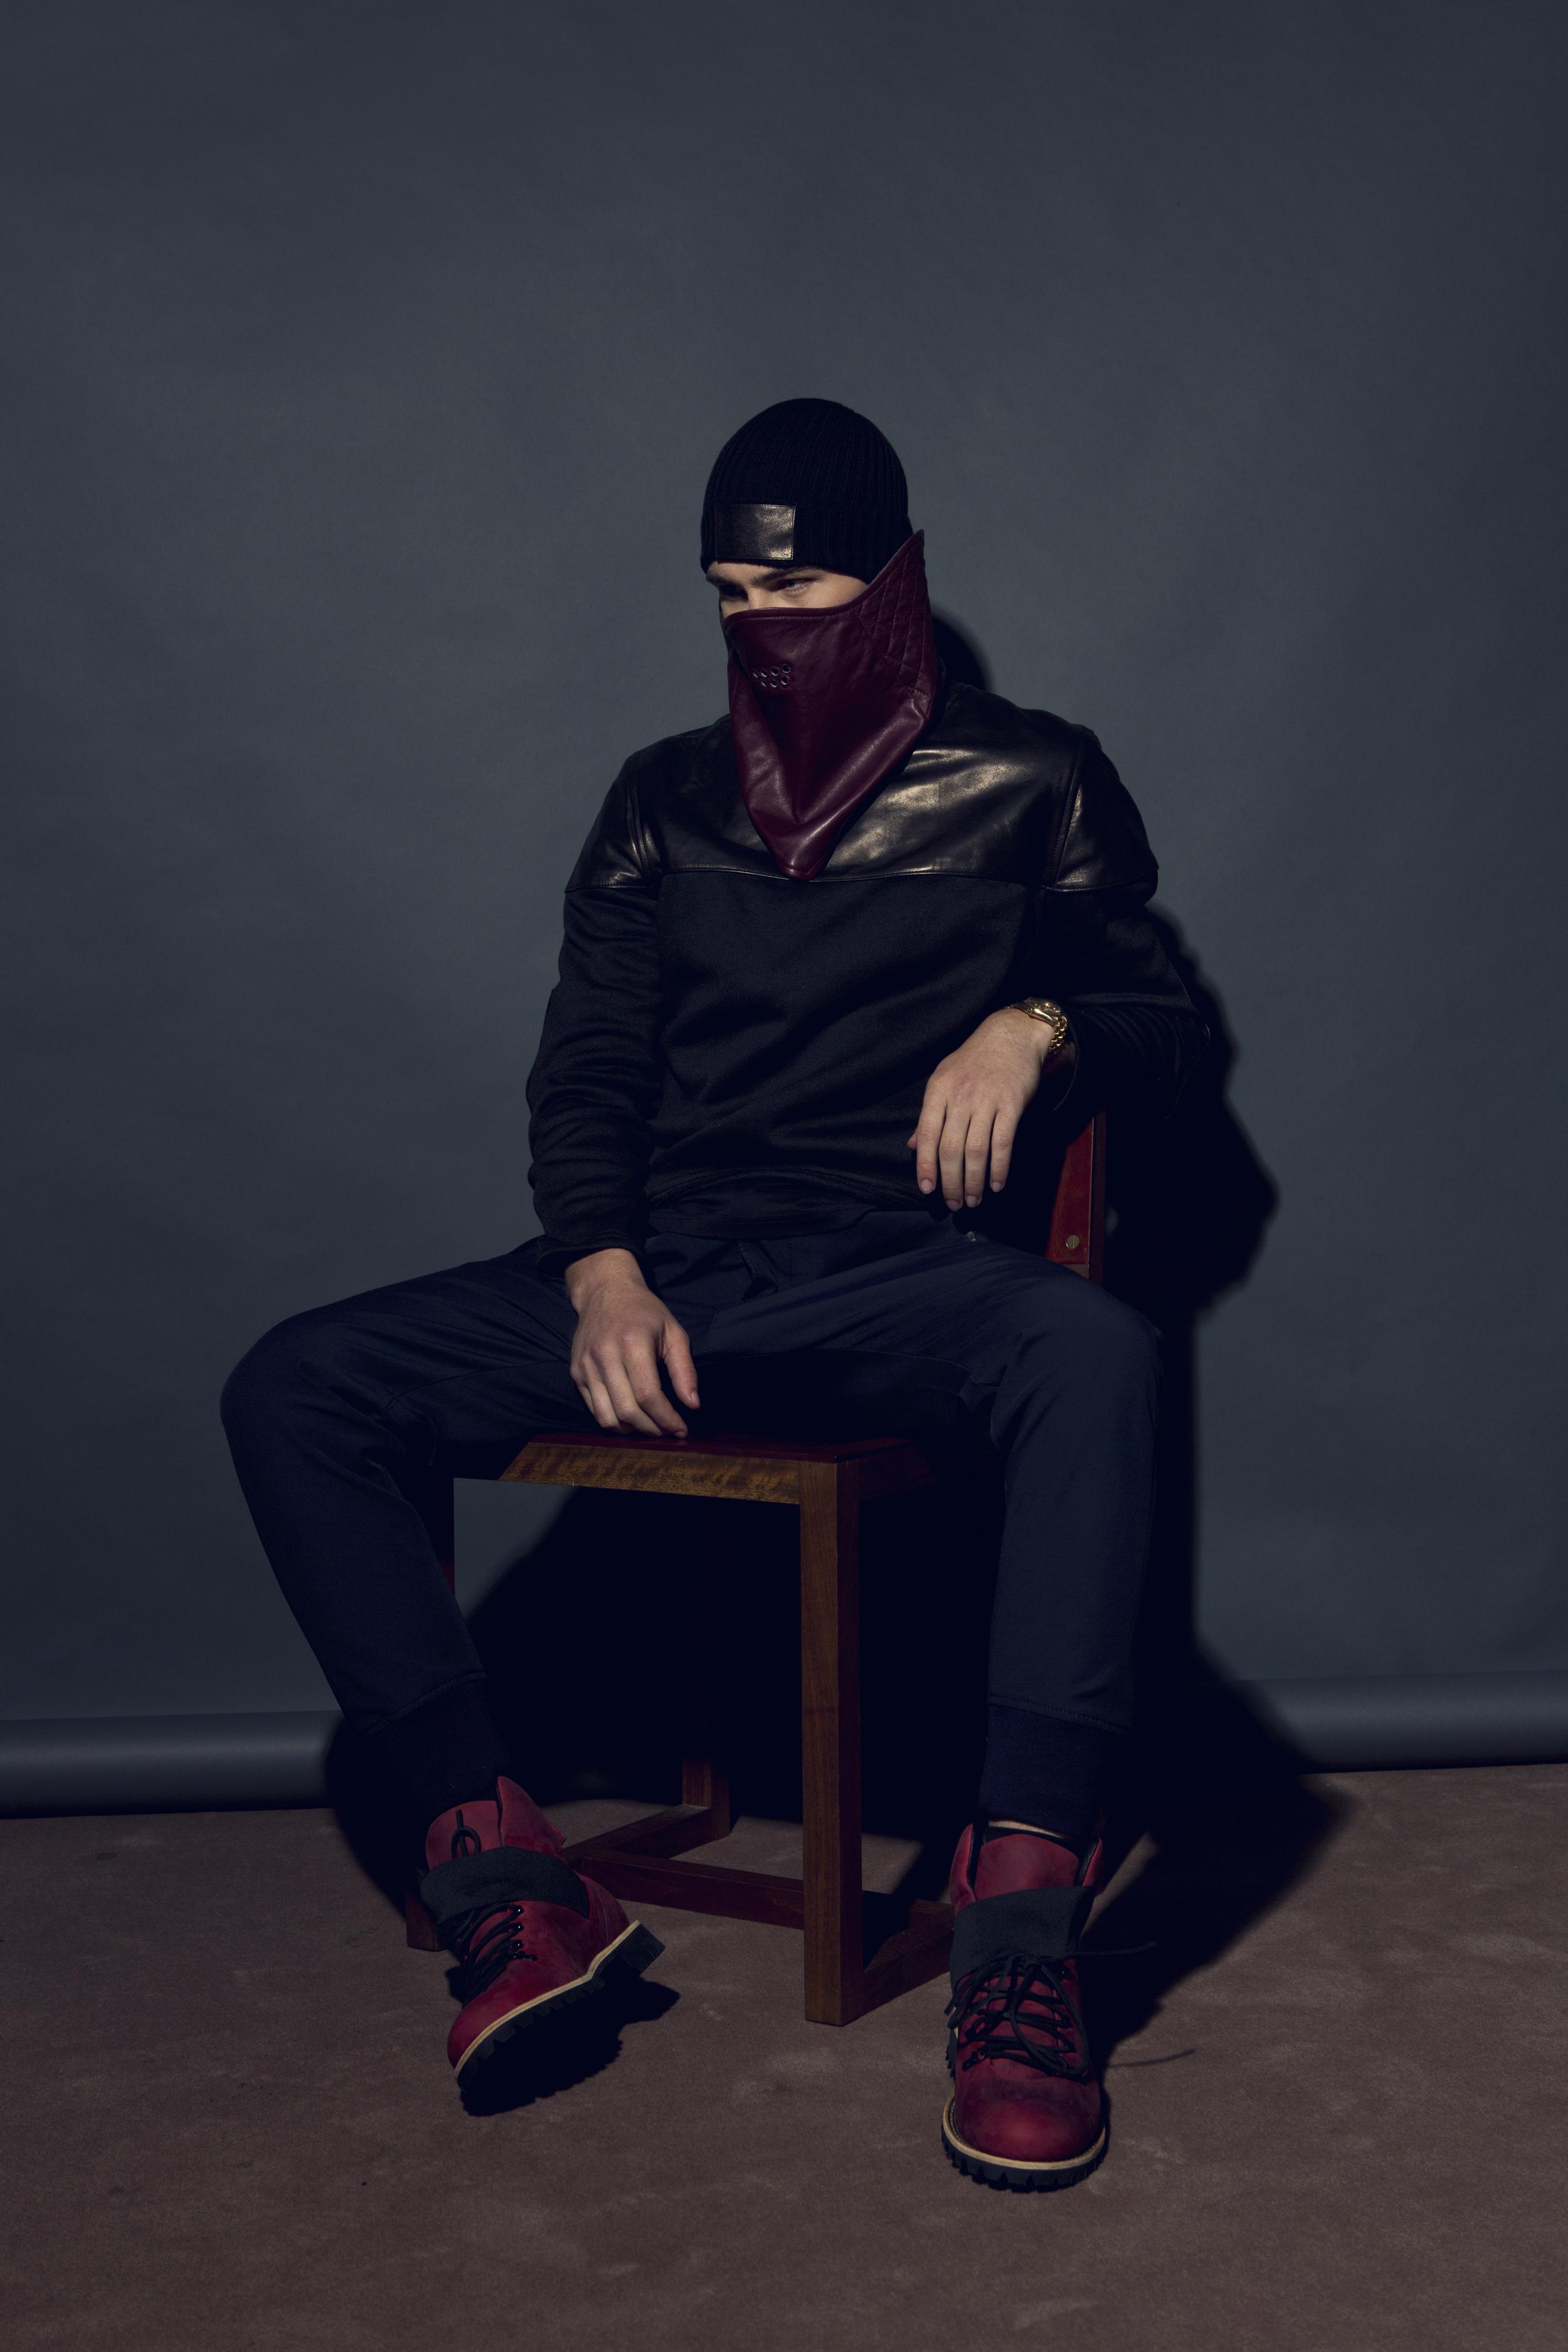 HSTRY x Grungy Gentleman 4.jpg